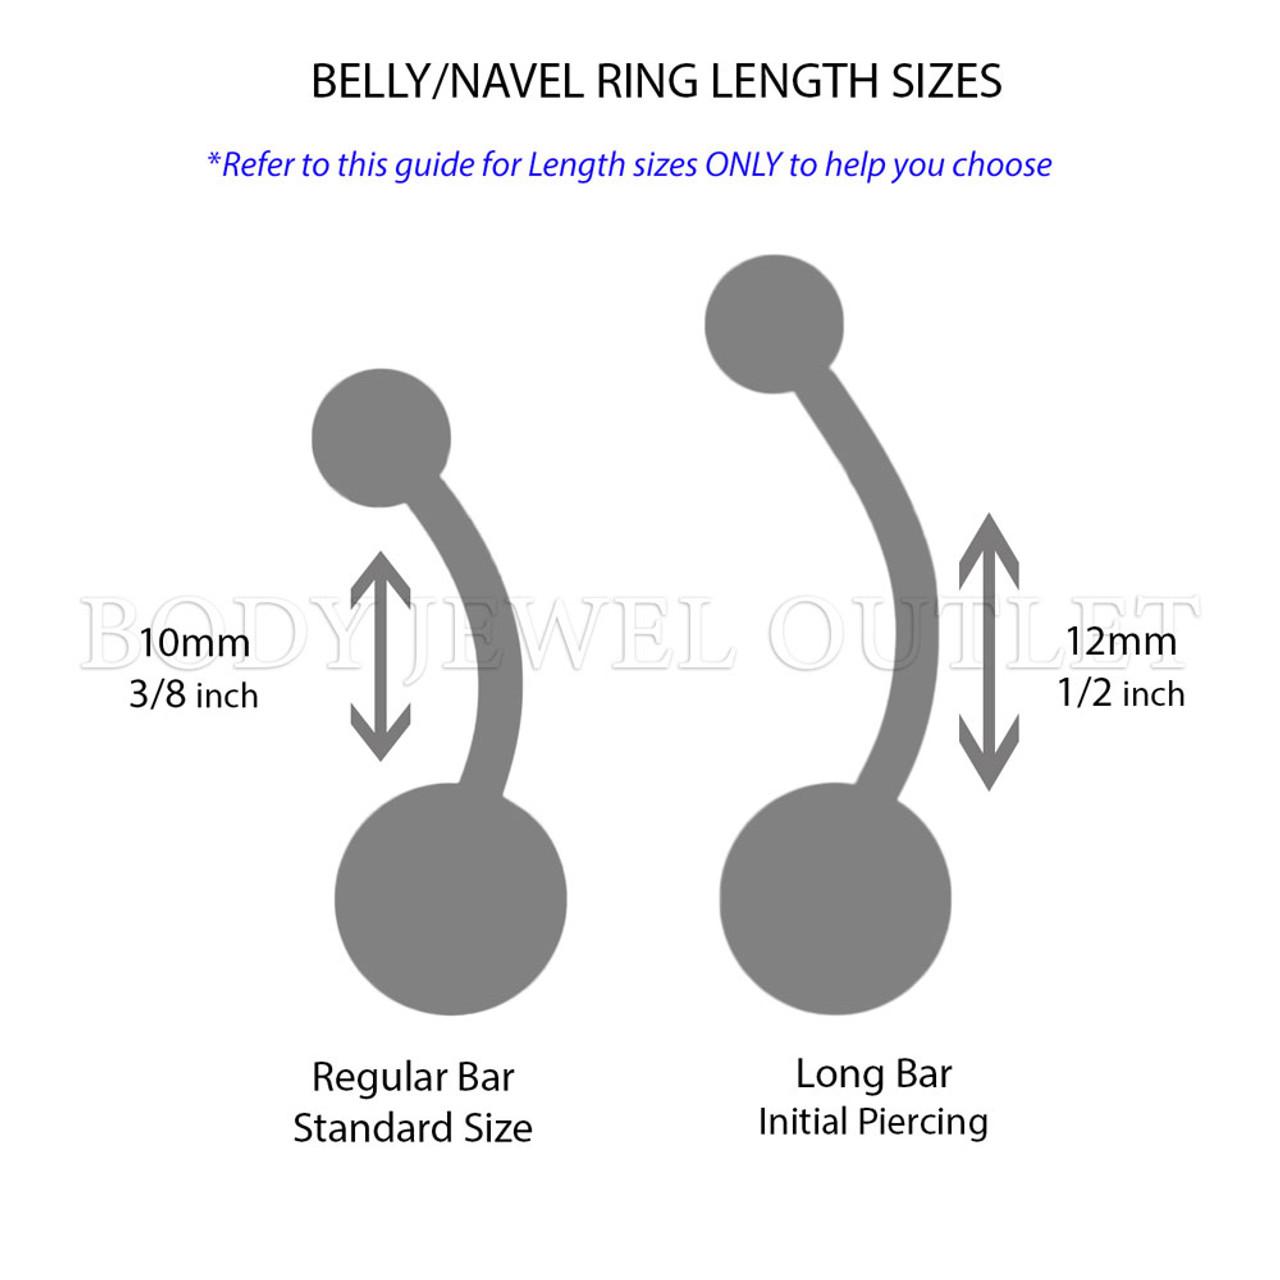 Pink GLOW in the Dark Acrylic Balls - Bio Flex Acrylic Belly/Navel Ring Piercing - 14 Gauge (1 Piece)